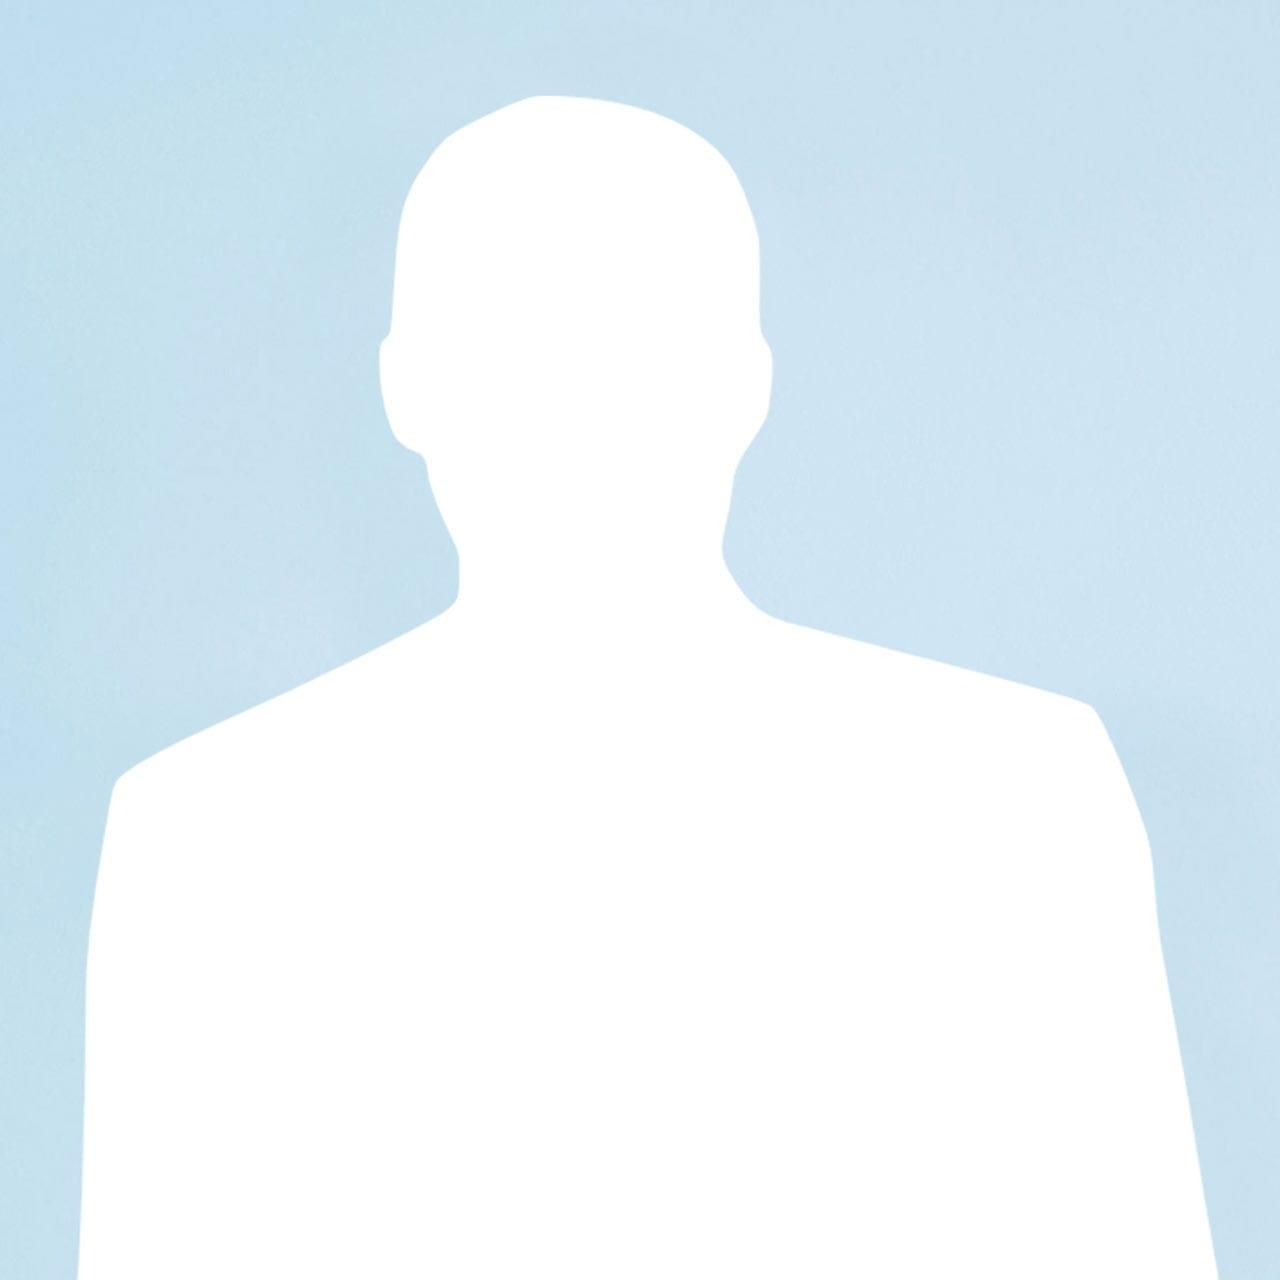 blank staff avatar rev 1.4 Meet the Team